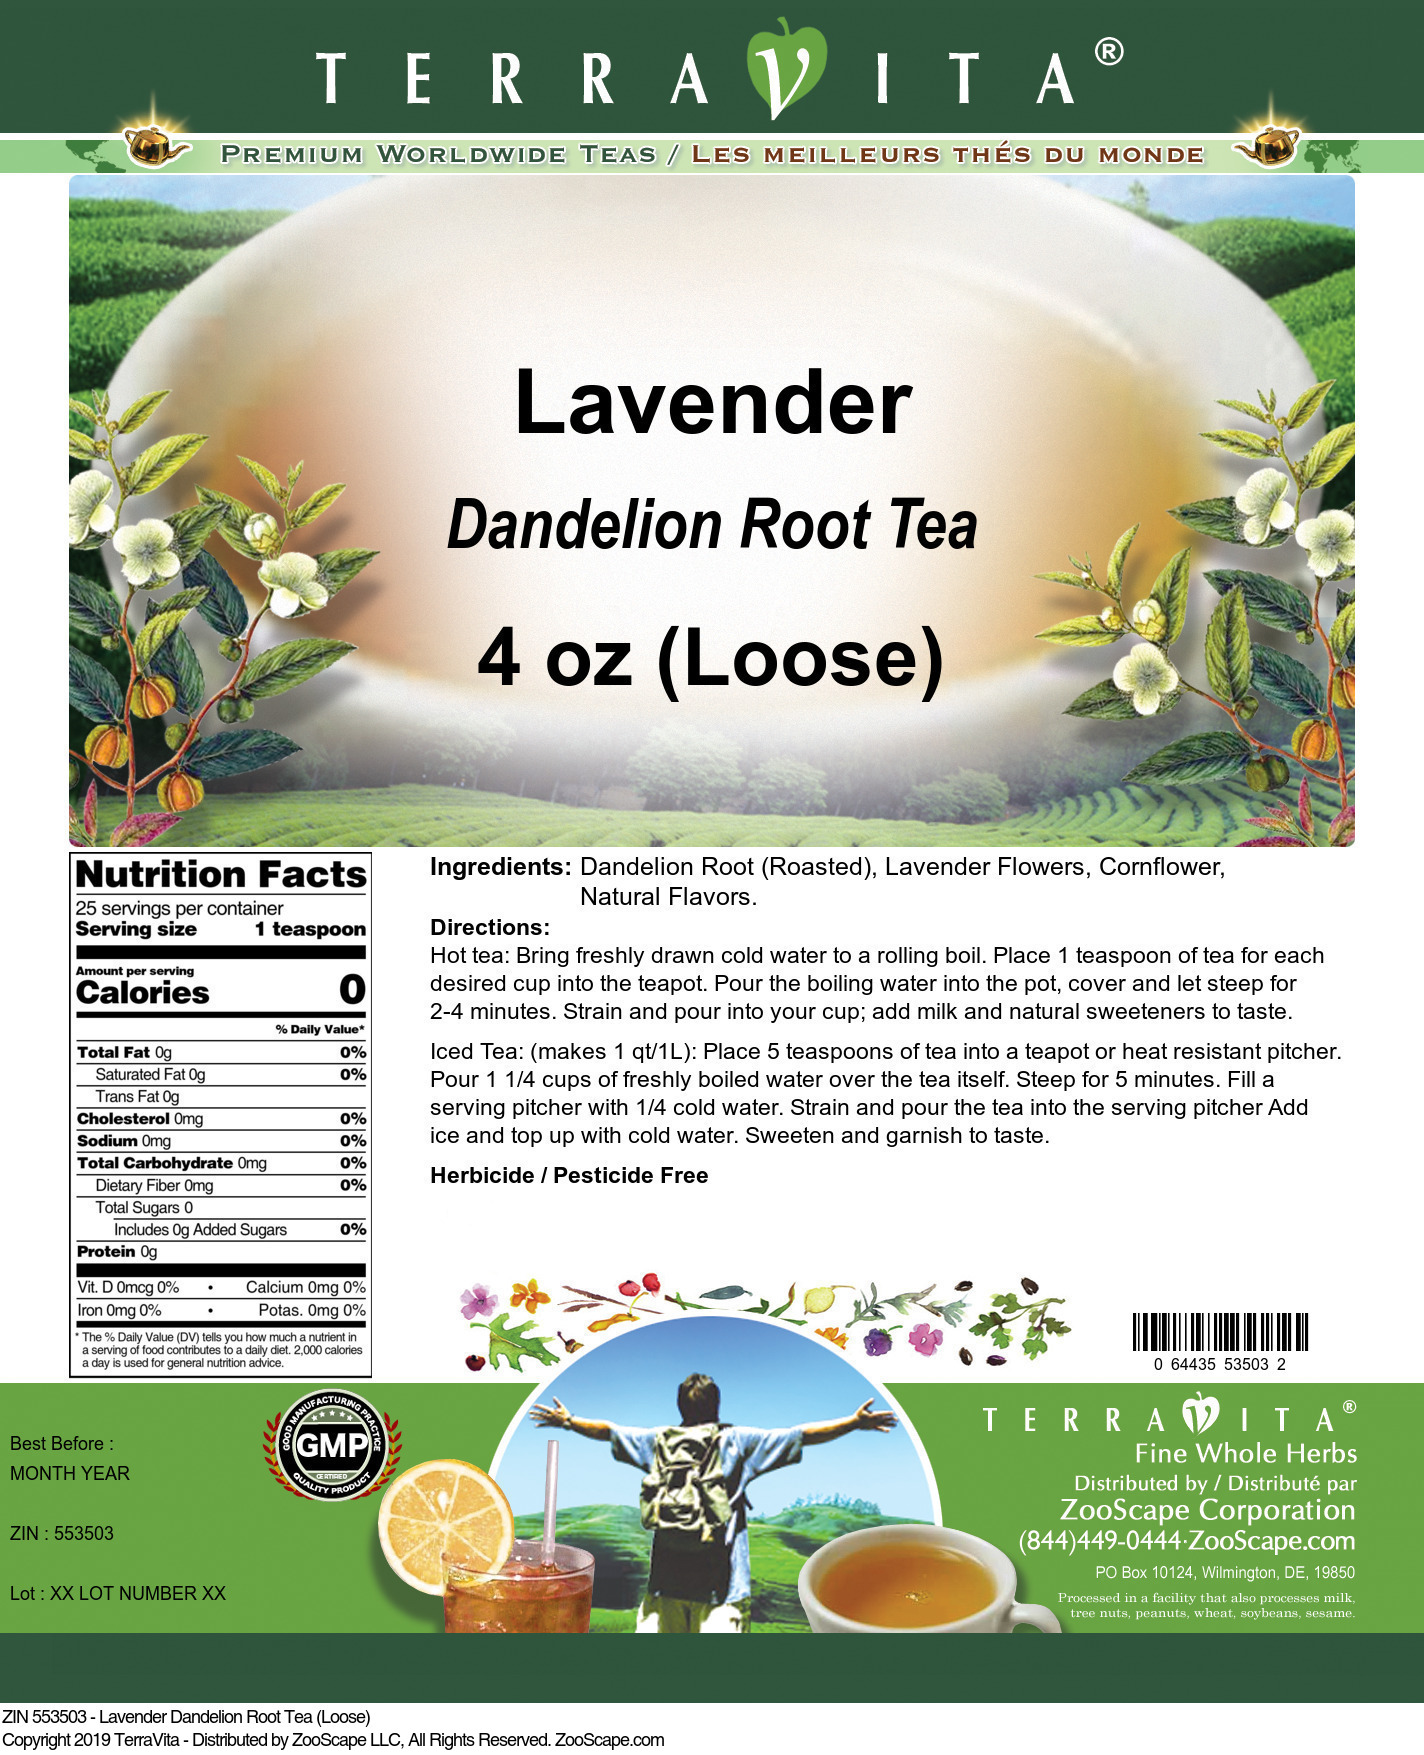 Lavender Dandelion Root Tea (Loose)